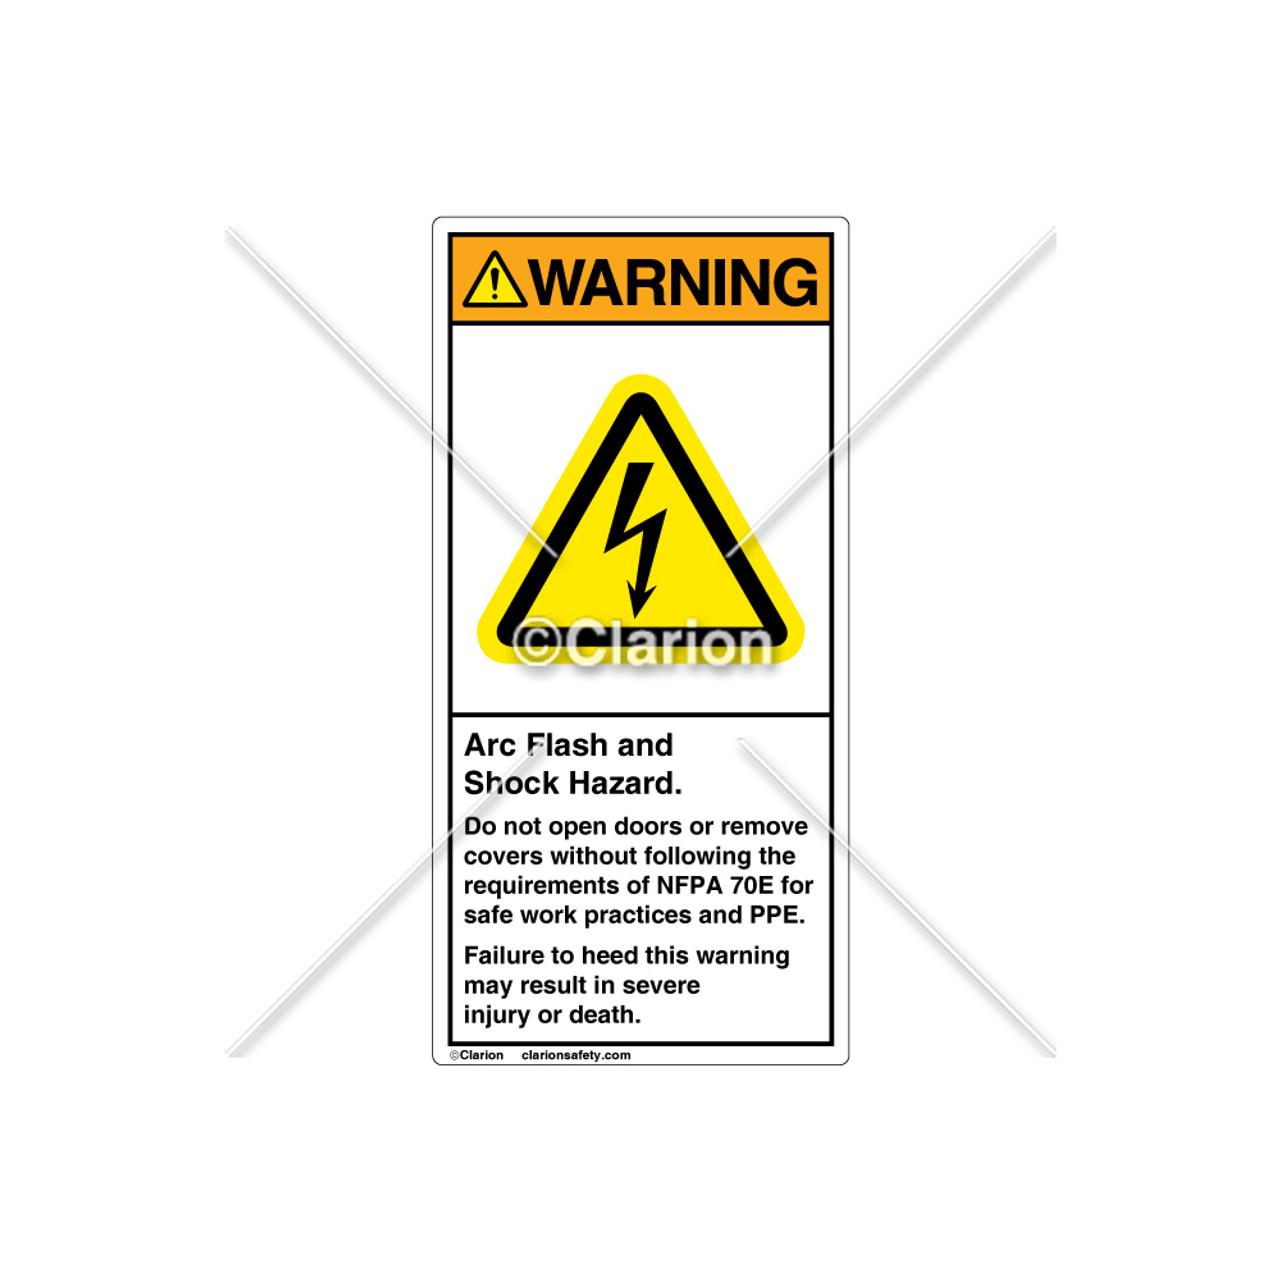 Nfpa warning label